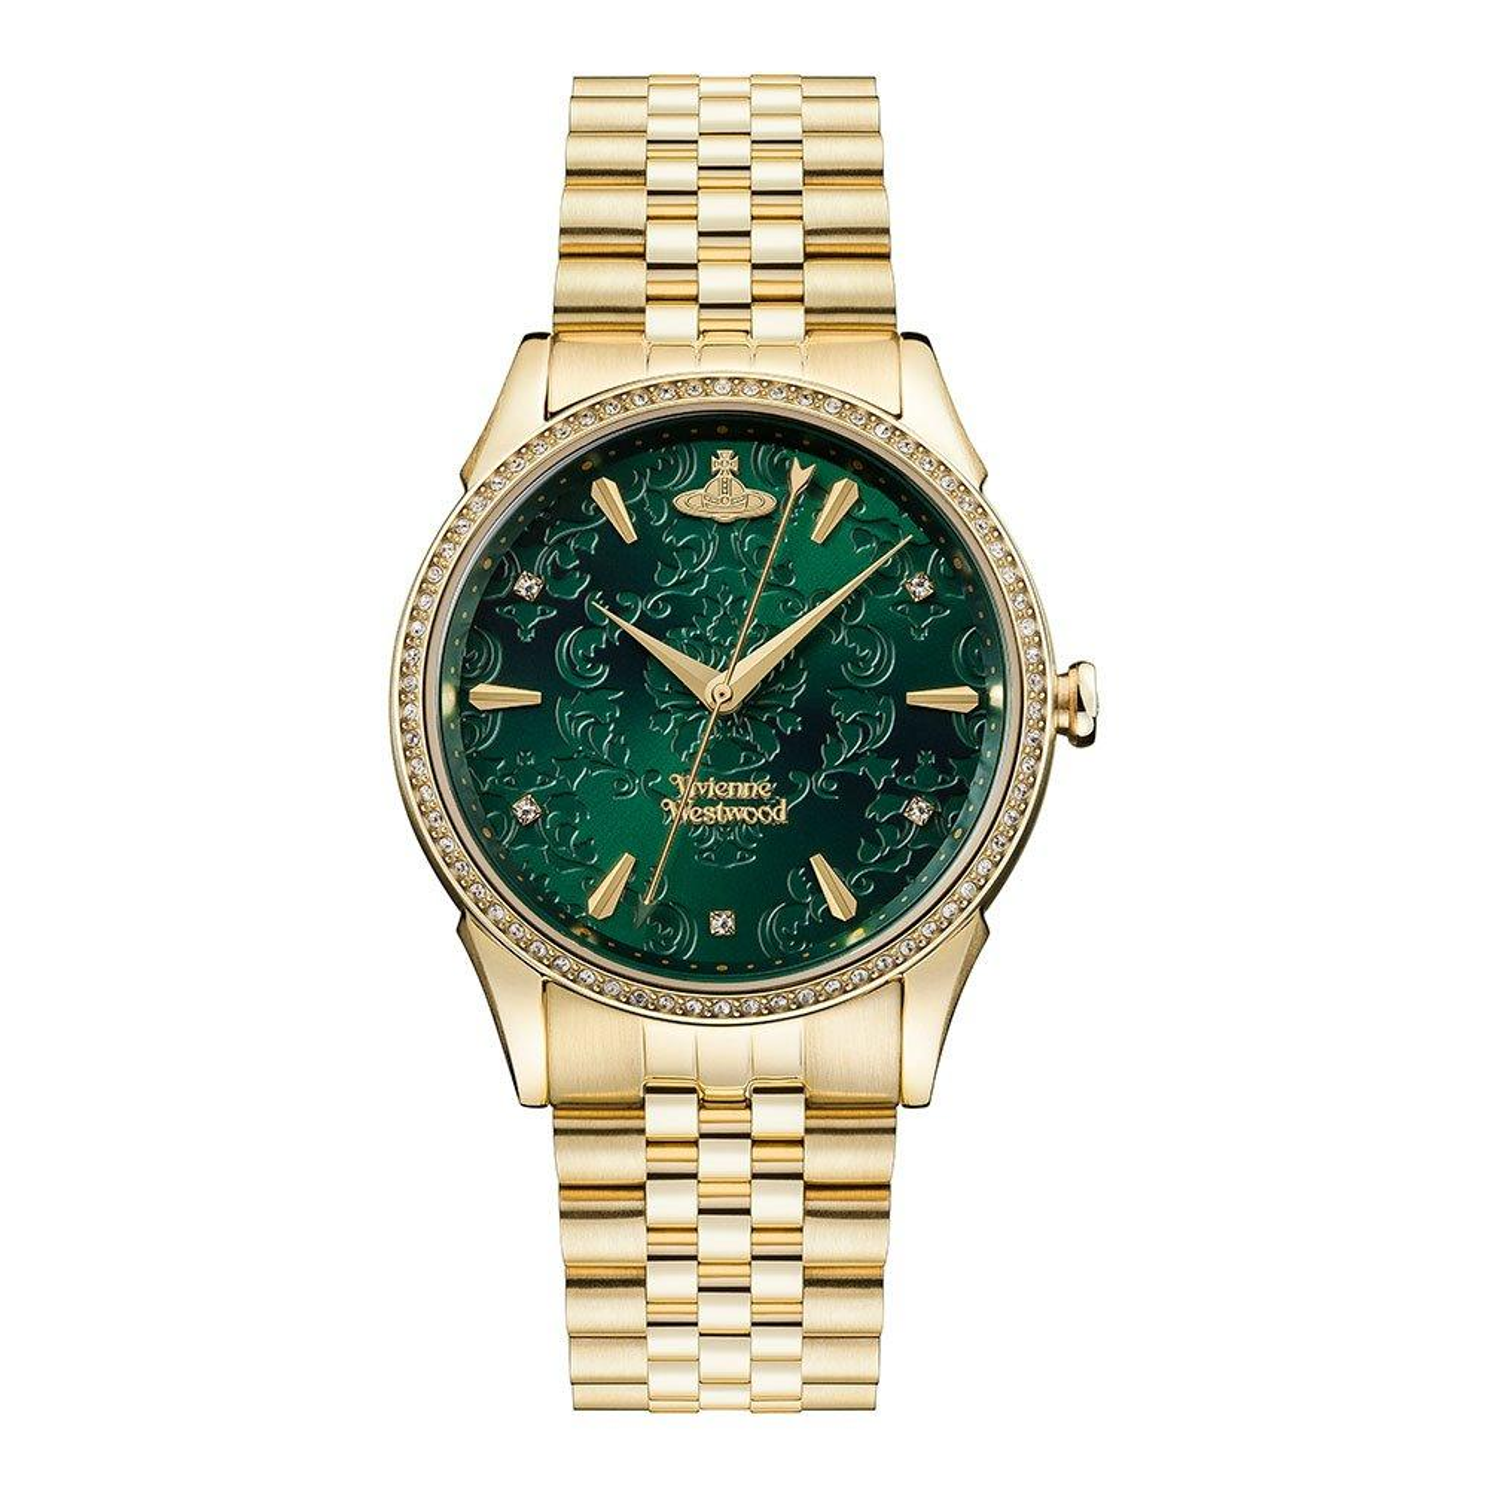 Vivienne Westwood Wallace Gold Tone Ladies Watch